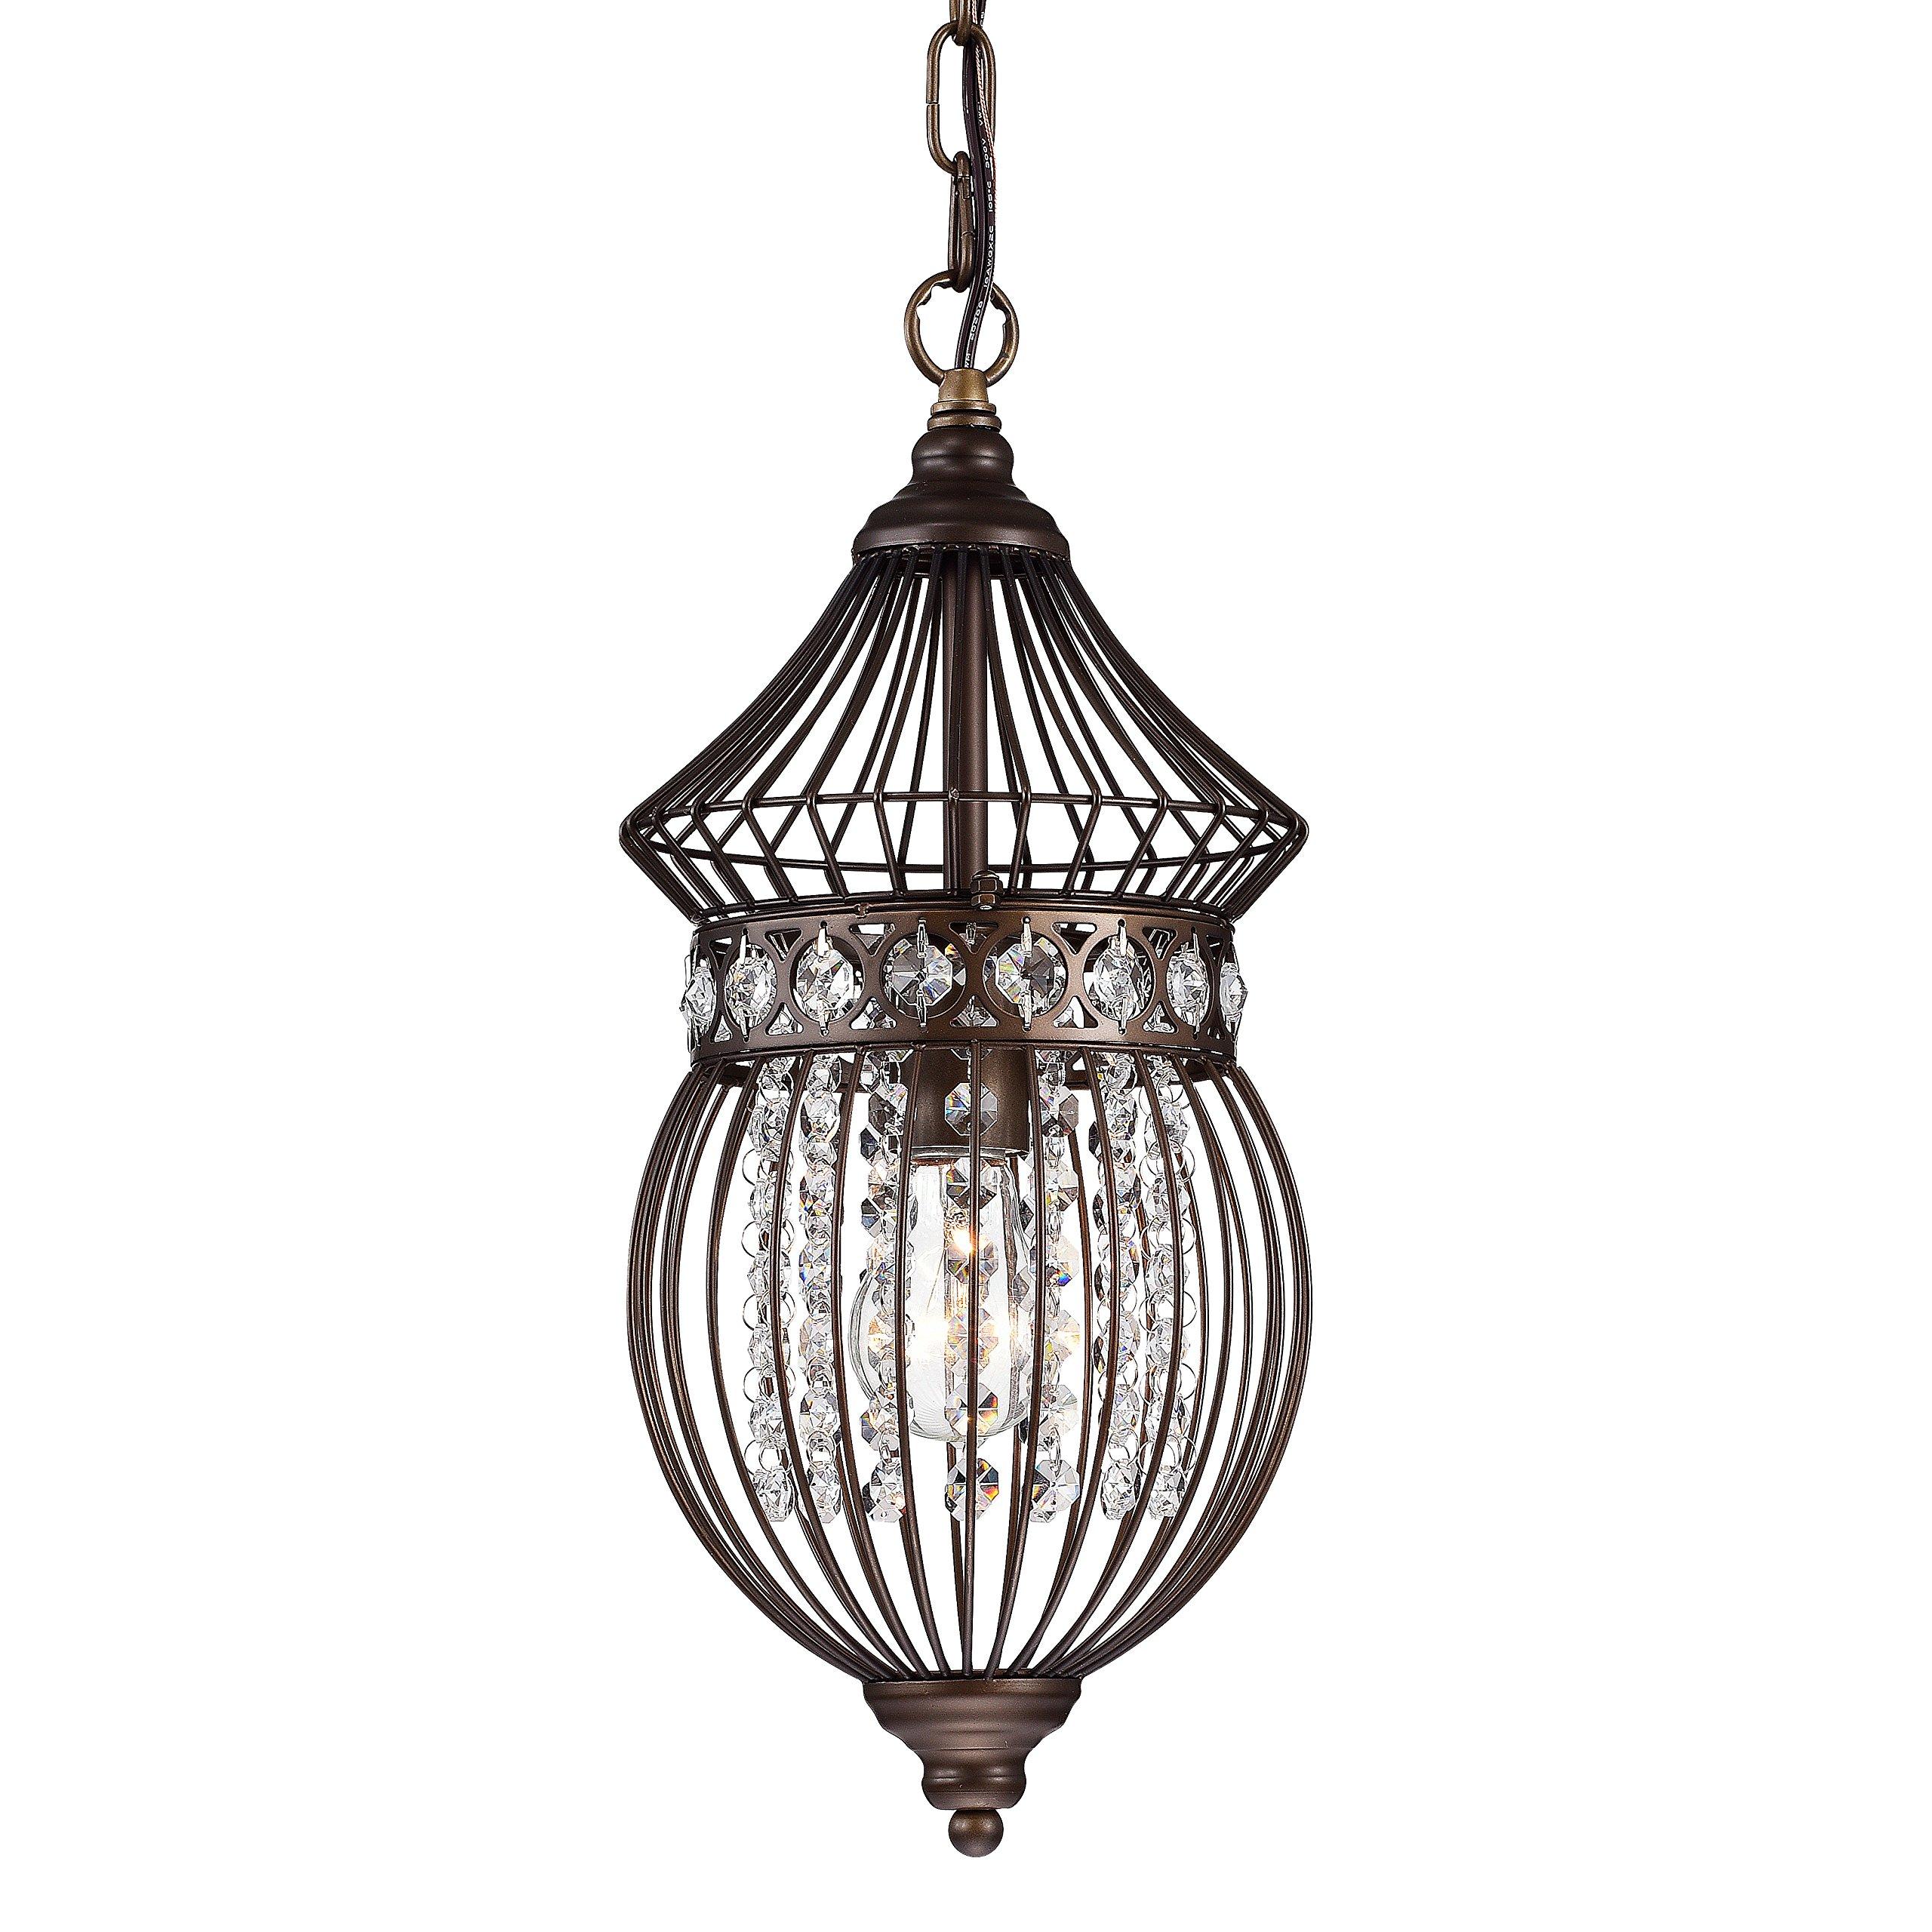 Crystal Bird Cage Chandelier Lighting Bronze Iron Chandelier Ceiling Light Fixture 1 Light 17045 by Go&So